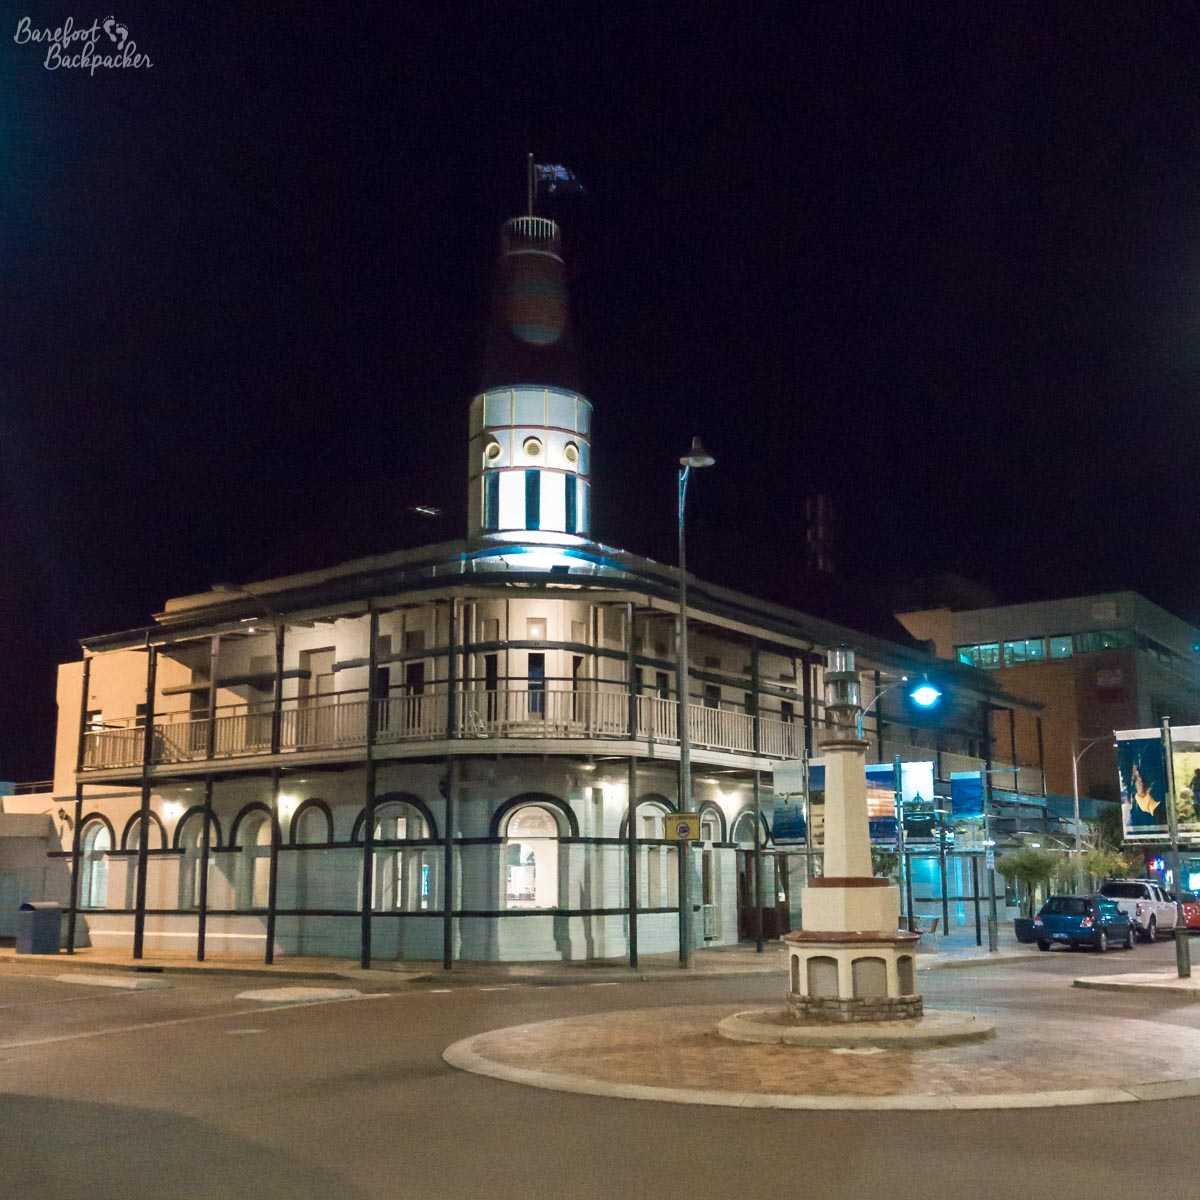 Geraldton, Western Australia, at night.